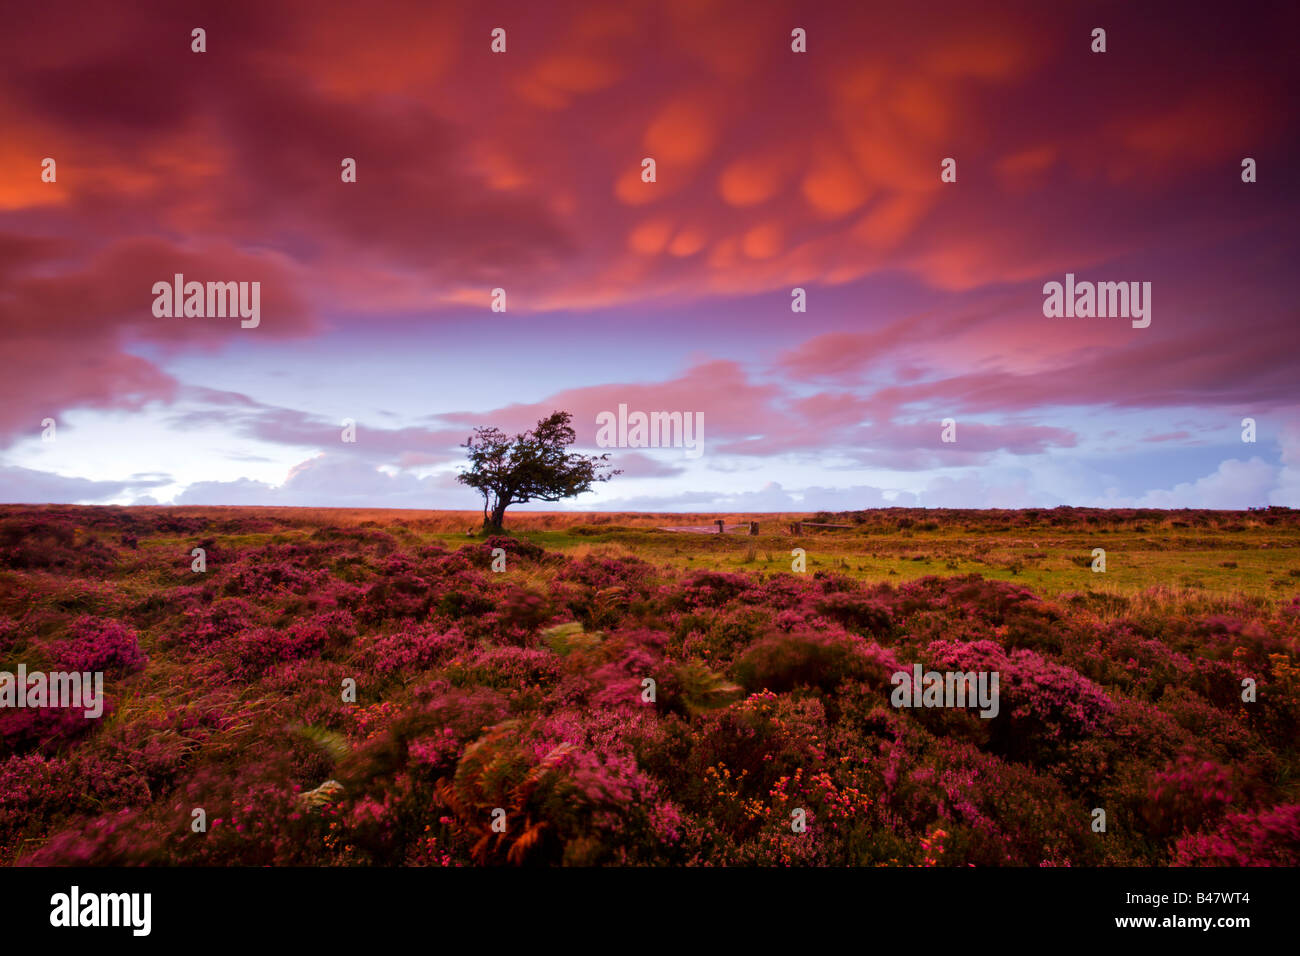 Stürmischer Sonnenuntergang über das Heidekraut Teppichboden Dunkery Hill Exmoor Nationalpark Somerset England Stockfoto